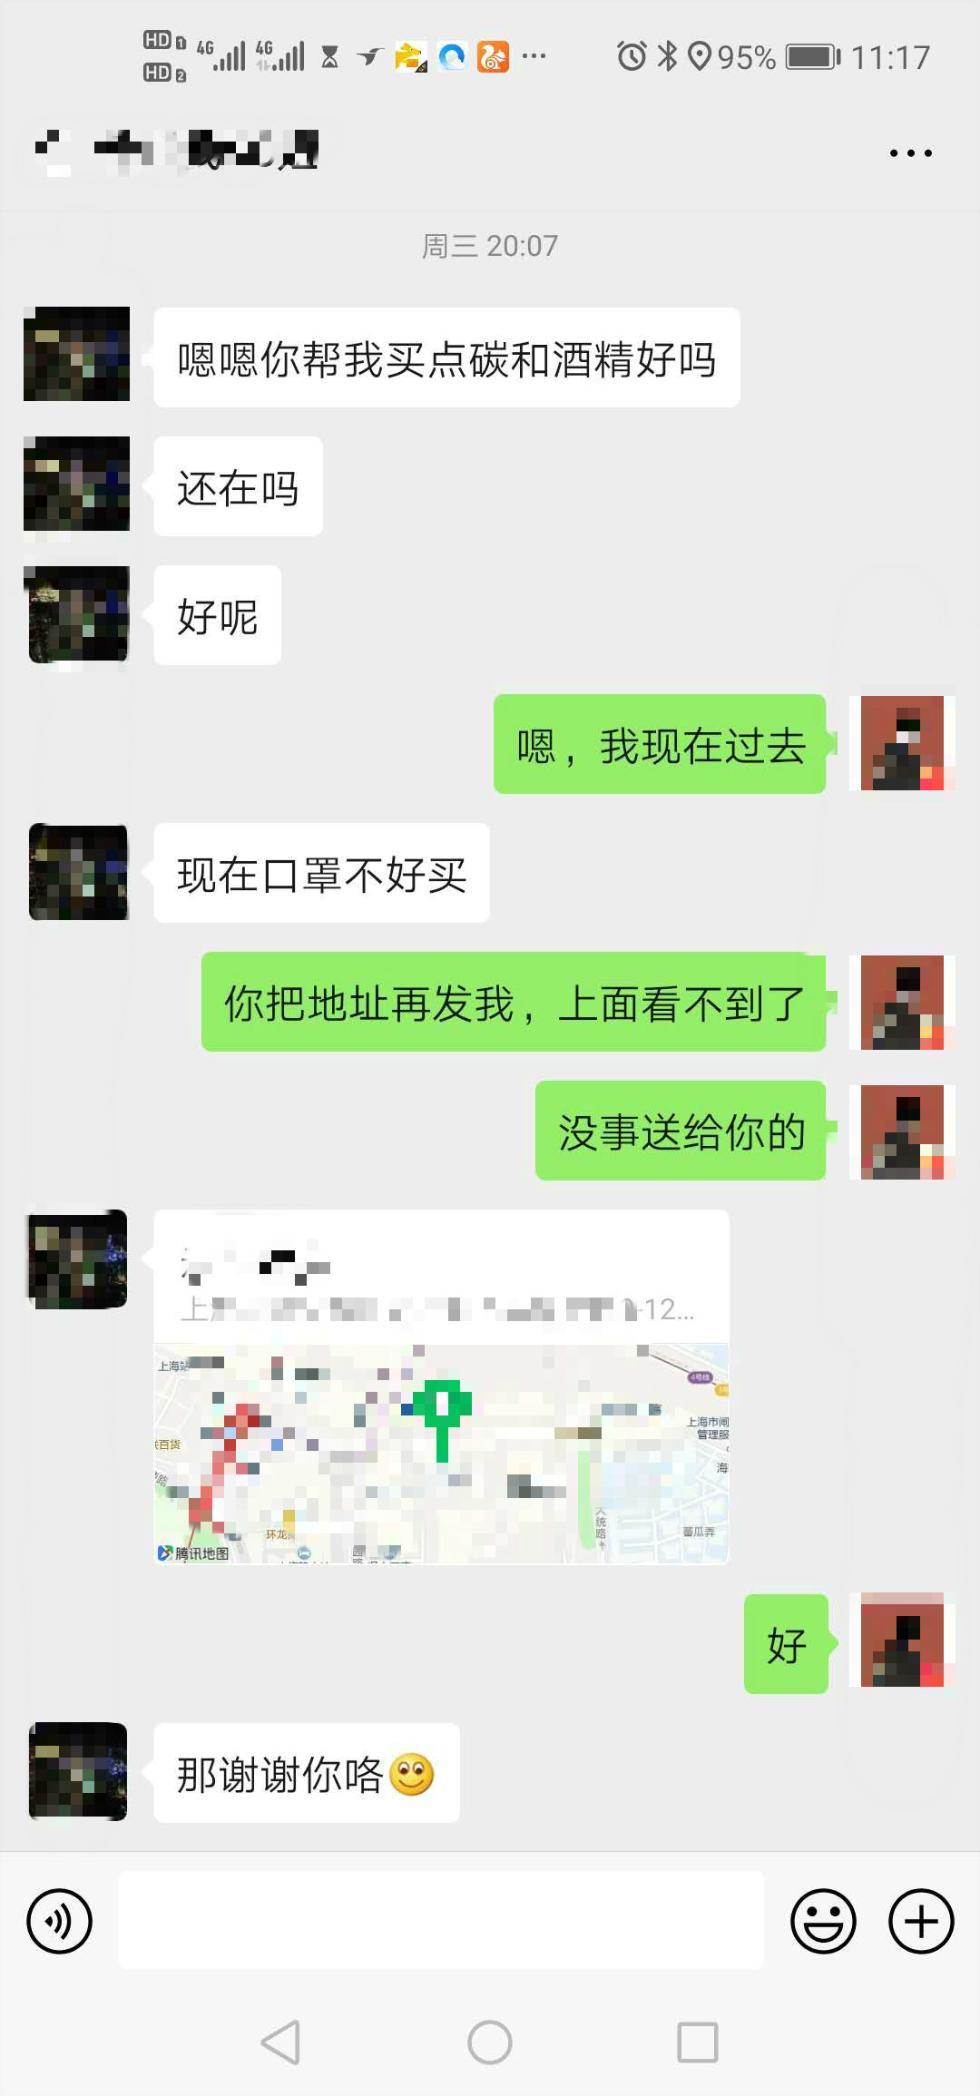 http://www.shangoudaohang.com/haitao/292327.html